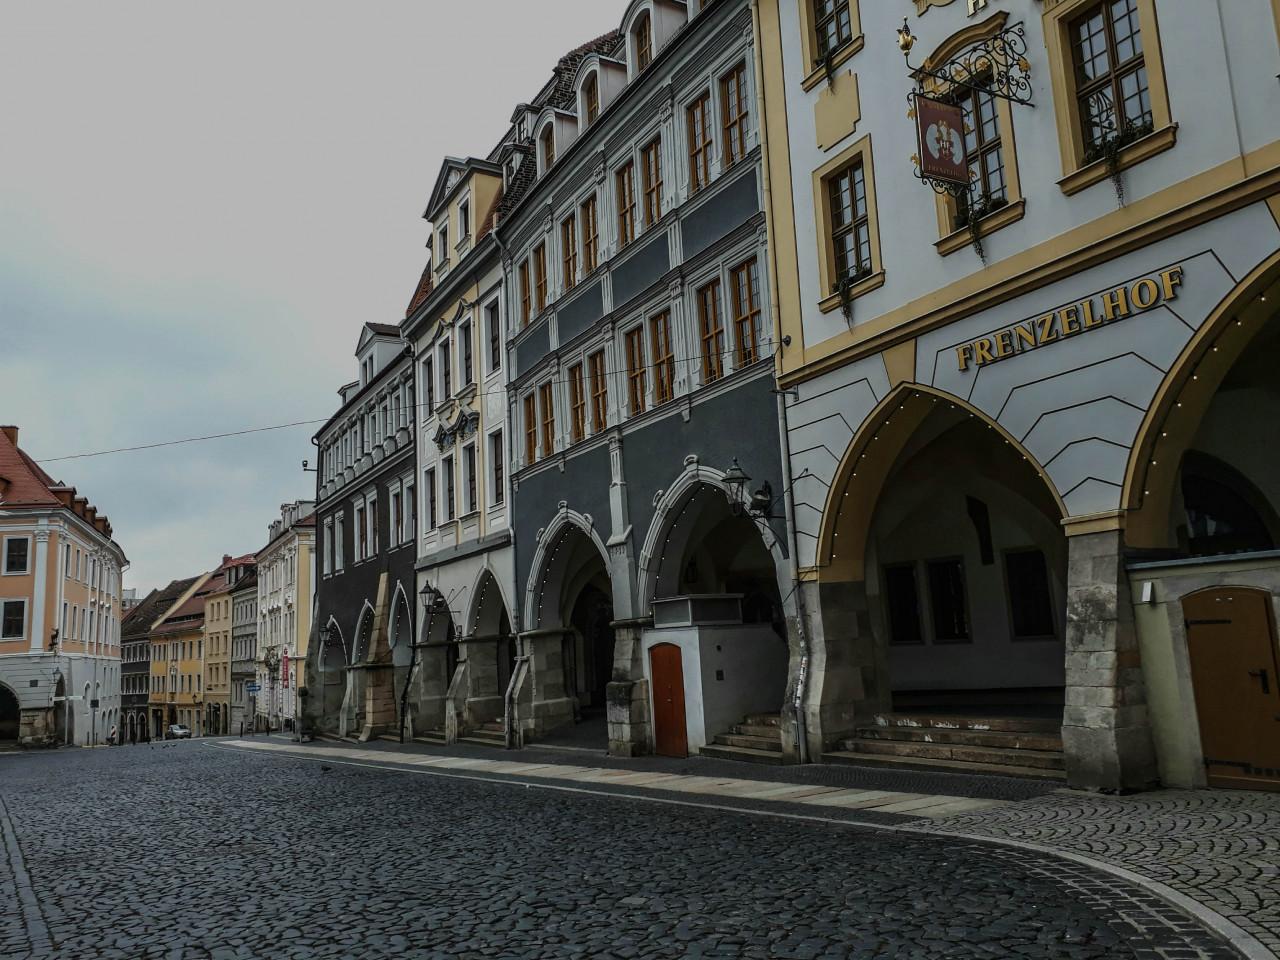 ...theFrenzelhof, a 500 year old hotel.